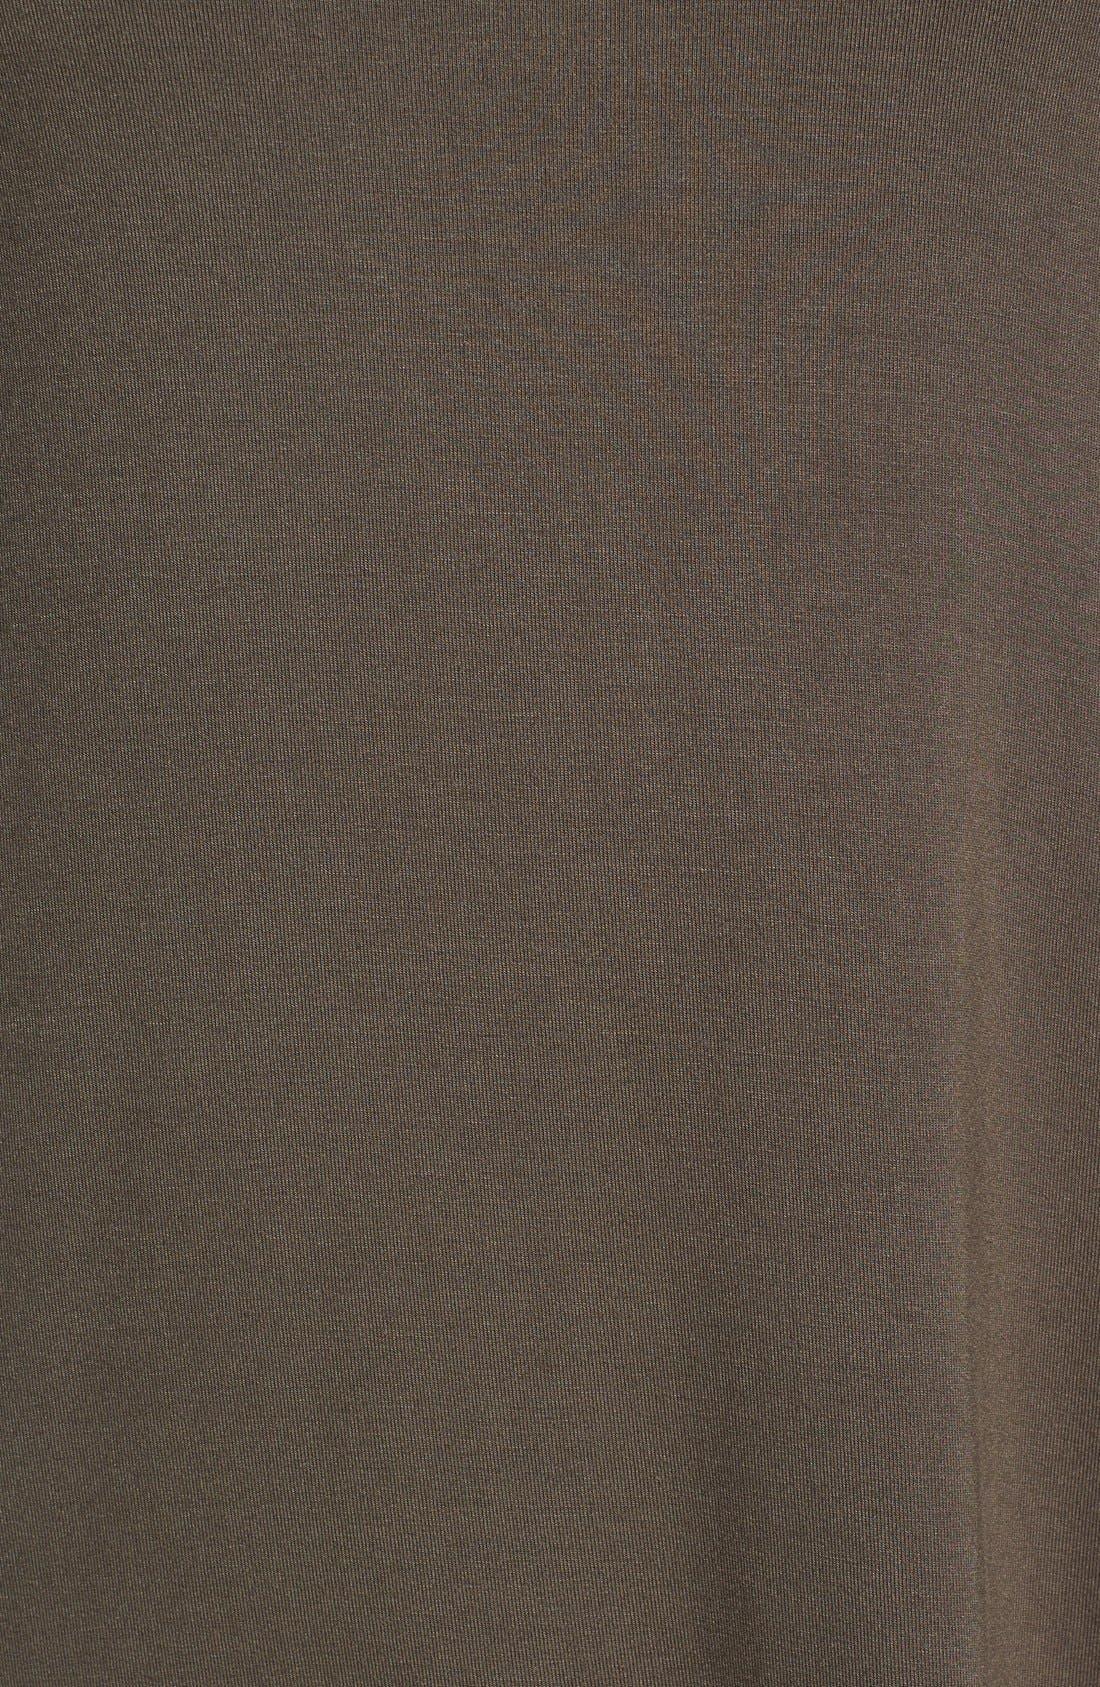 Cowl Neck Shift Dress,                             Alternate thumbnail 62, color,